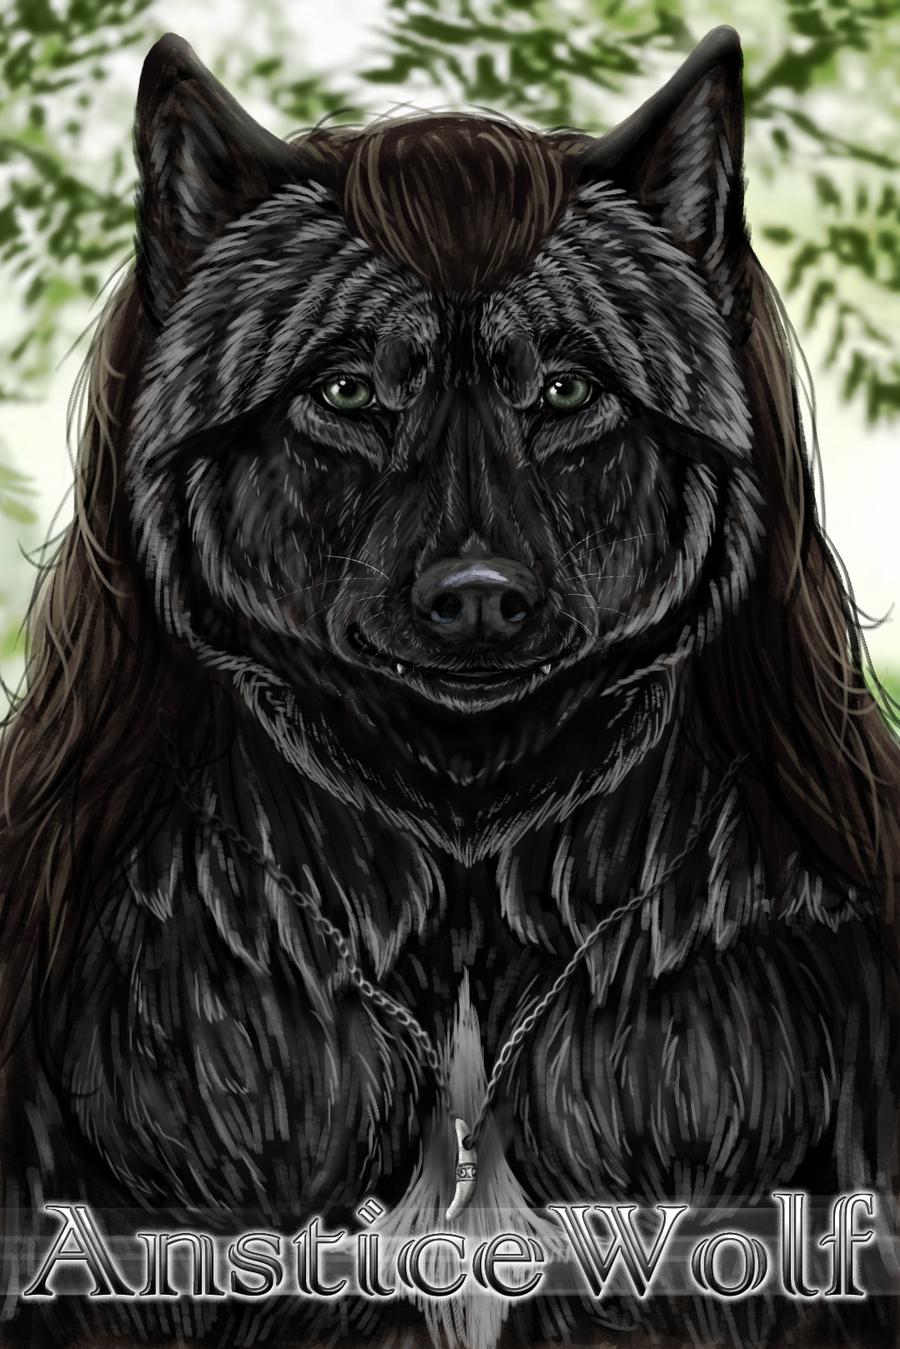 AnsticeWolf's Profile Picture